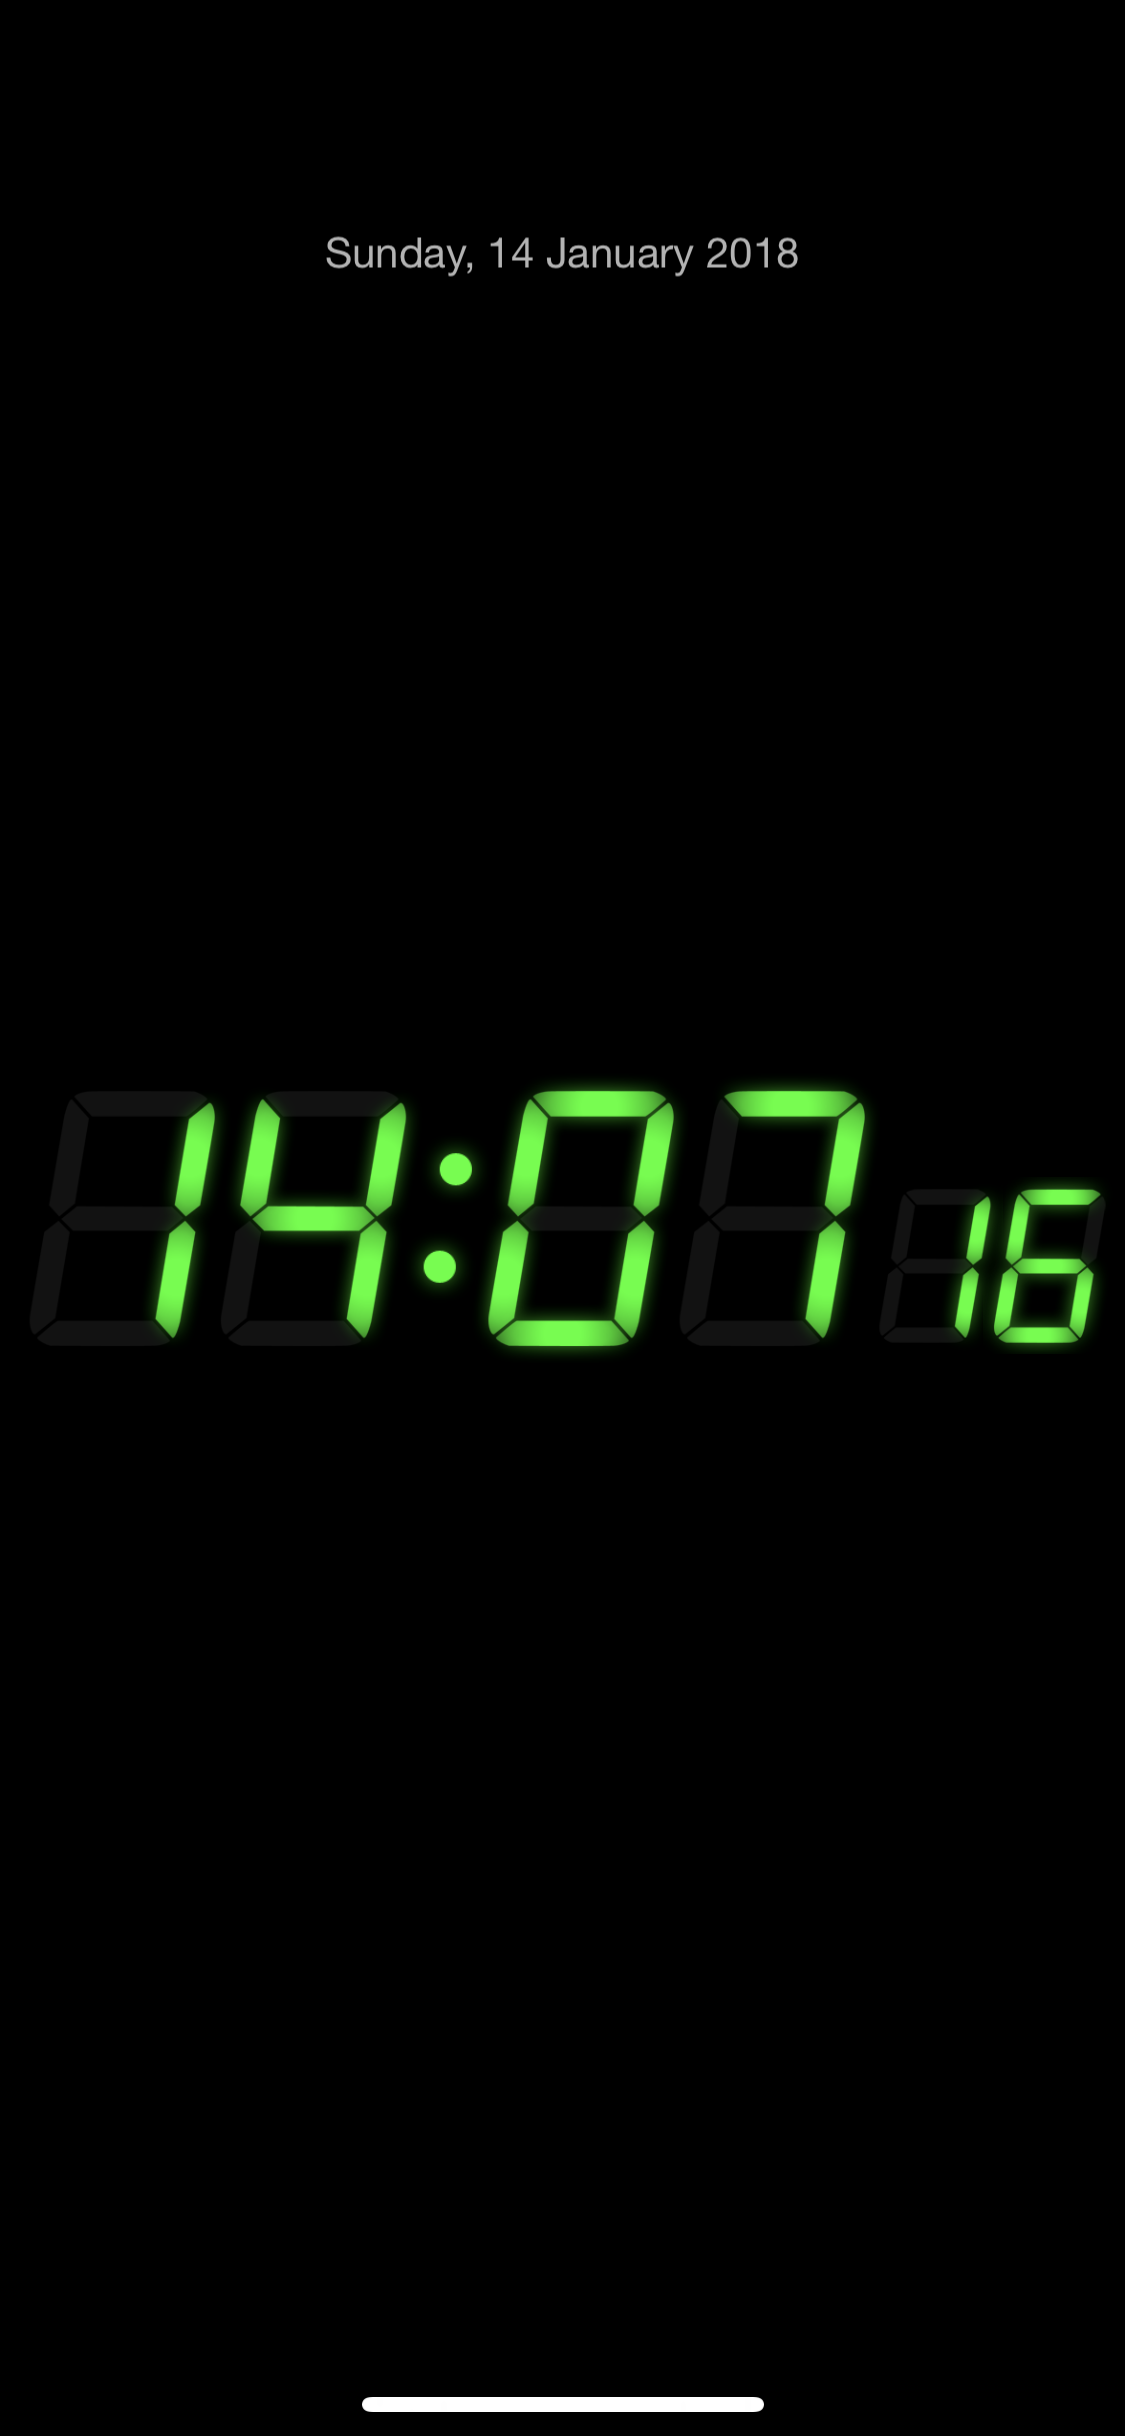 iPhone X iPhone X as nightstand clock